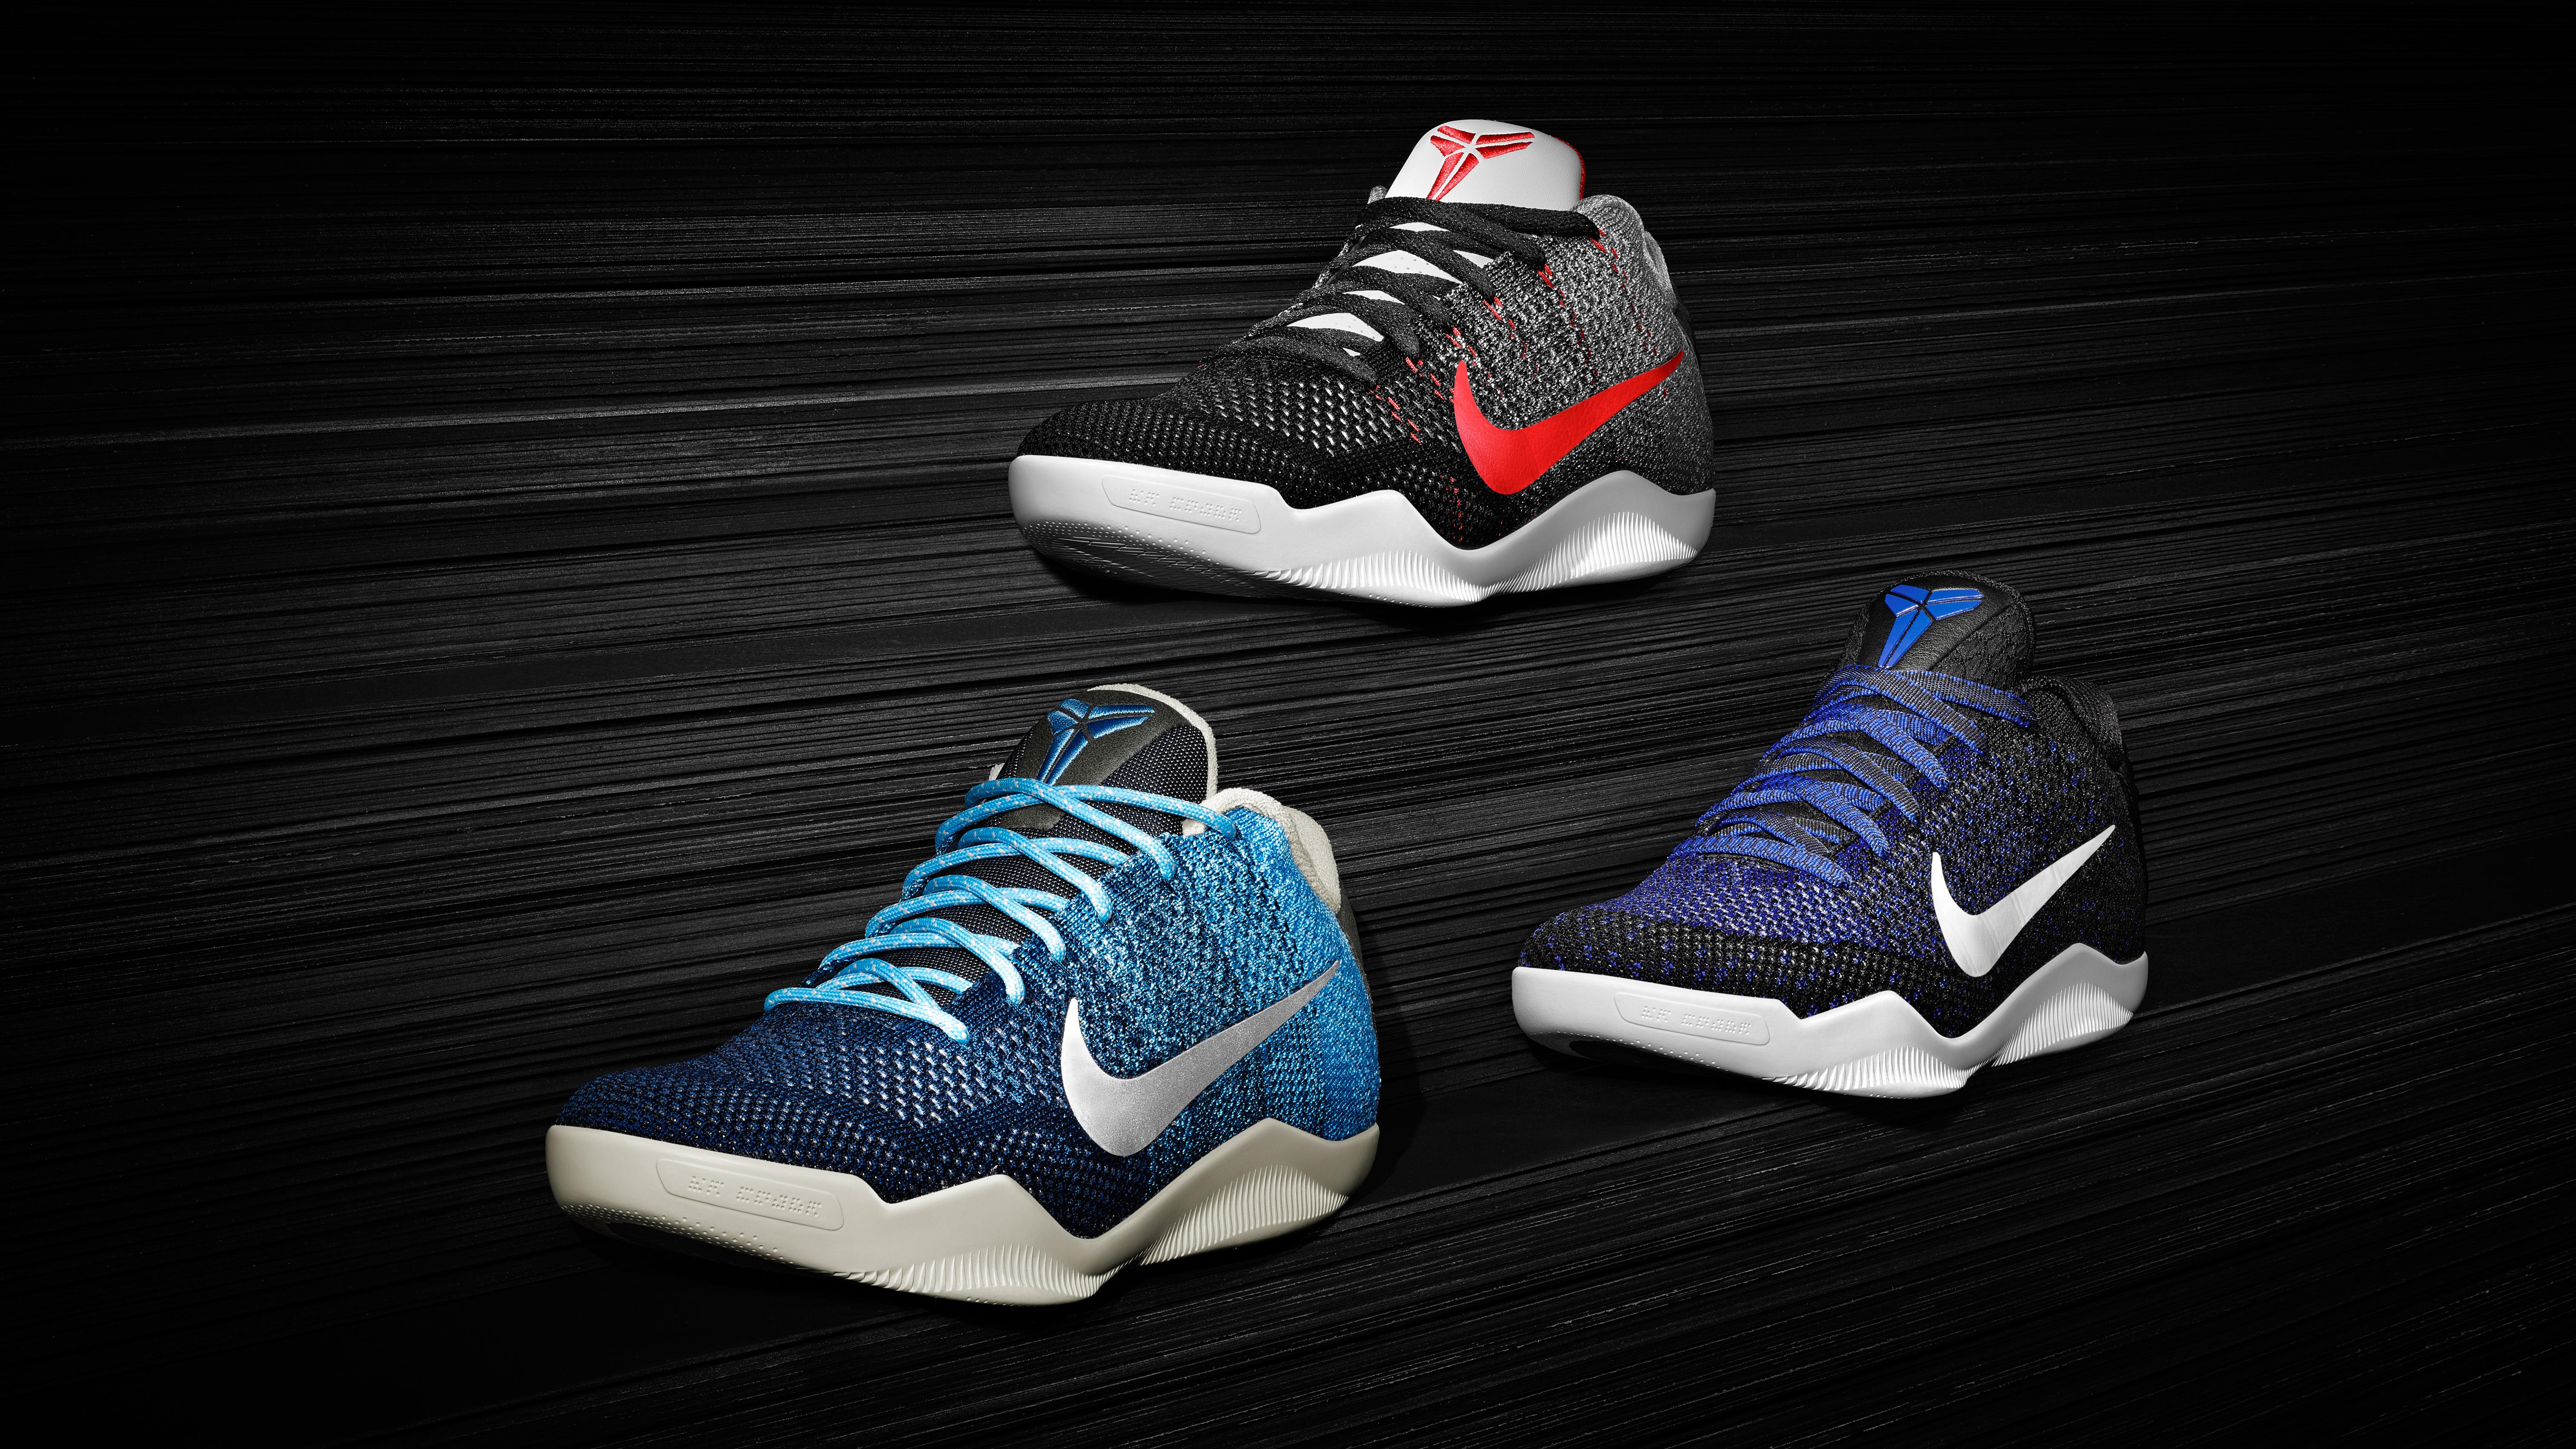 Kobe Bryant disegna una nuova linea di scarpe  Nike Kobe 11 Musa ... b82cf2b3725